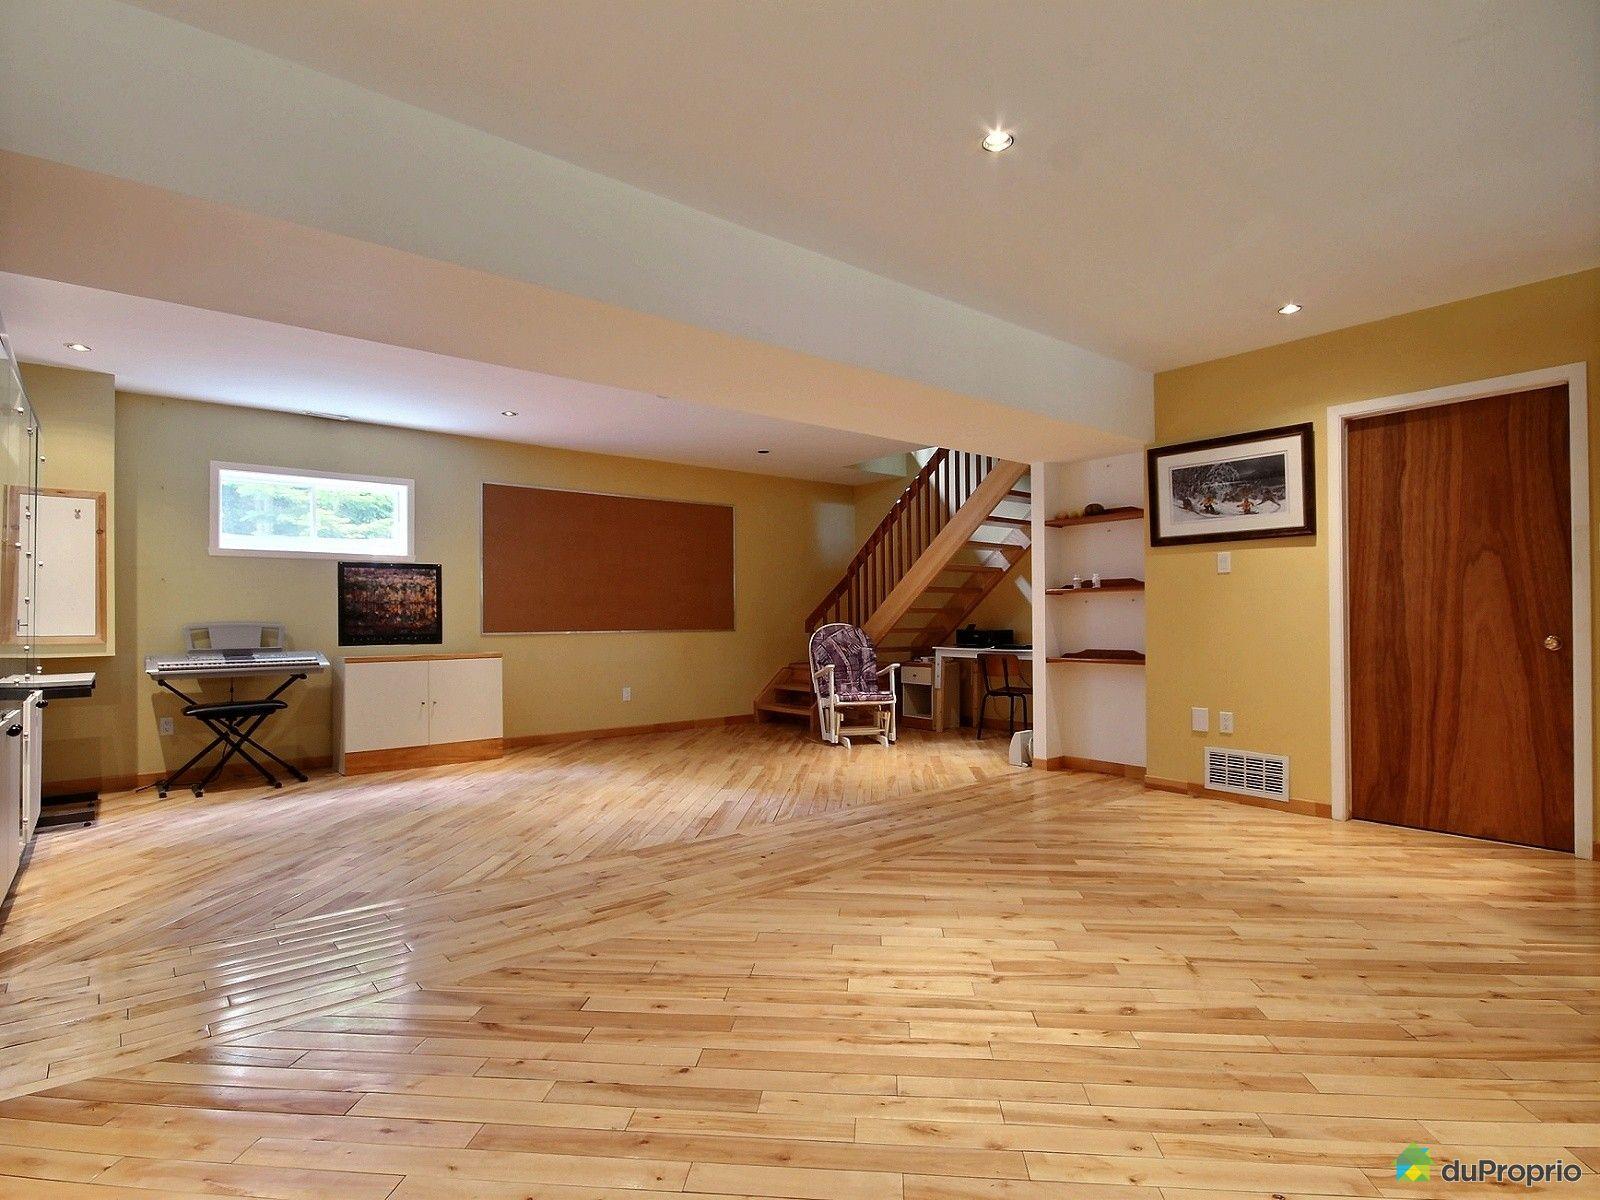 house for sale in la minerve 113 chemin daigneault sud